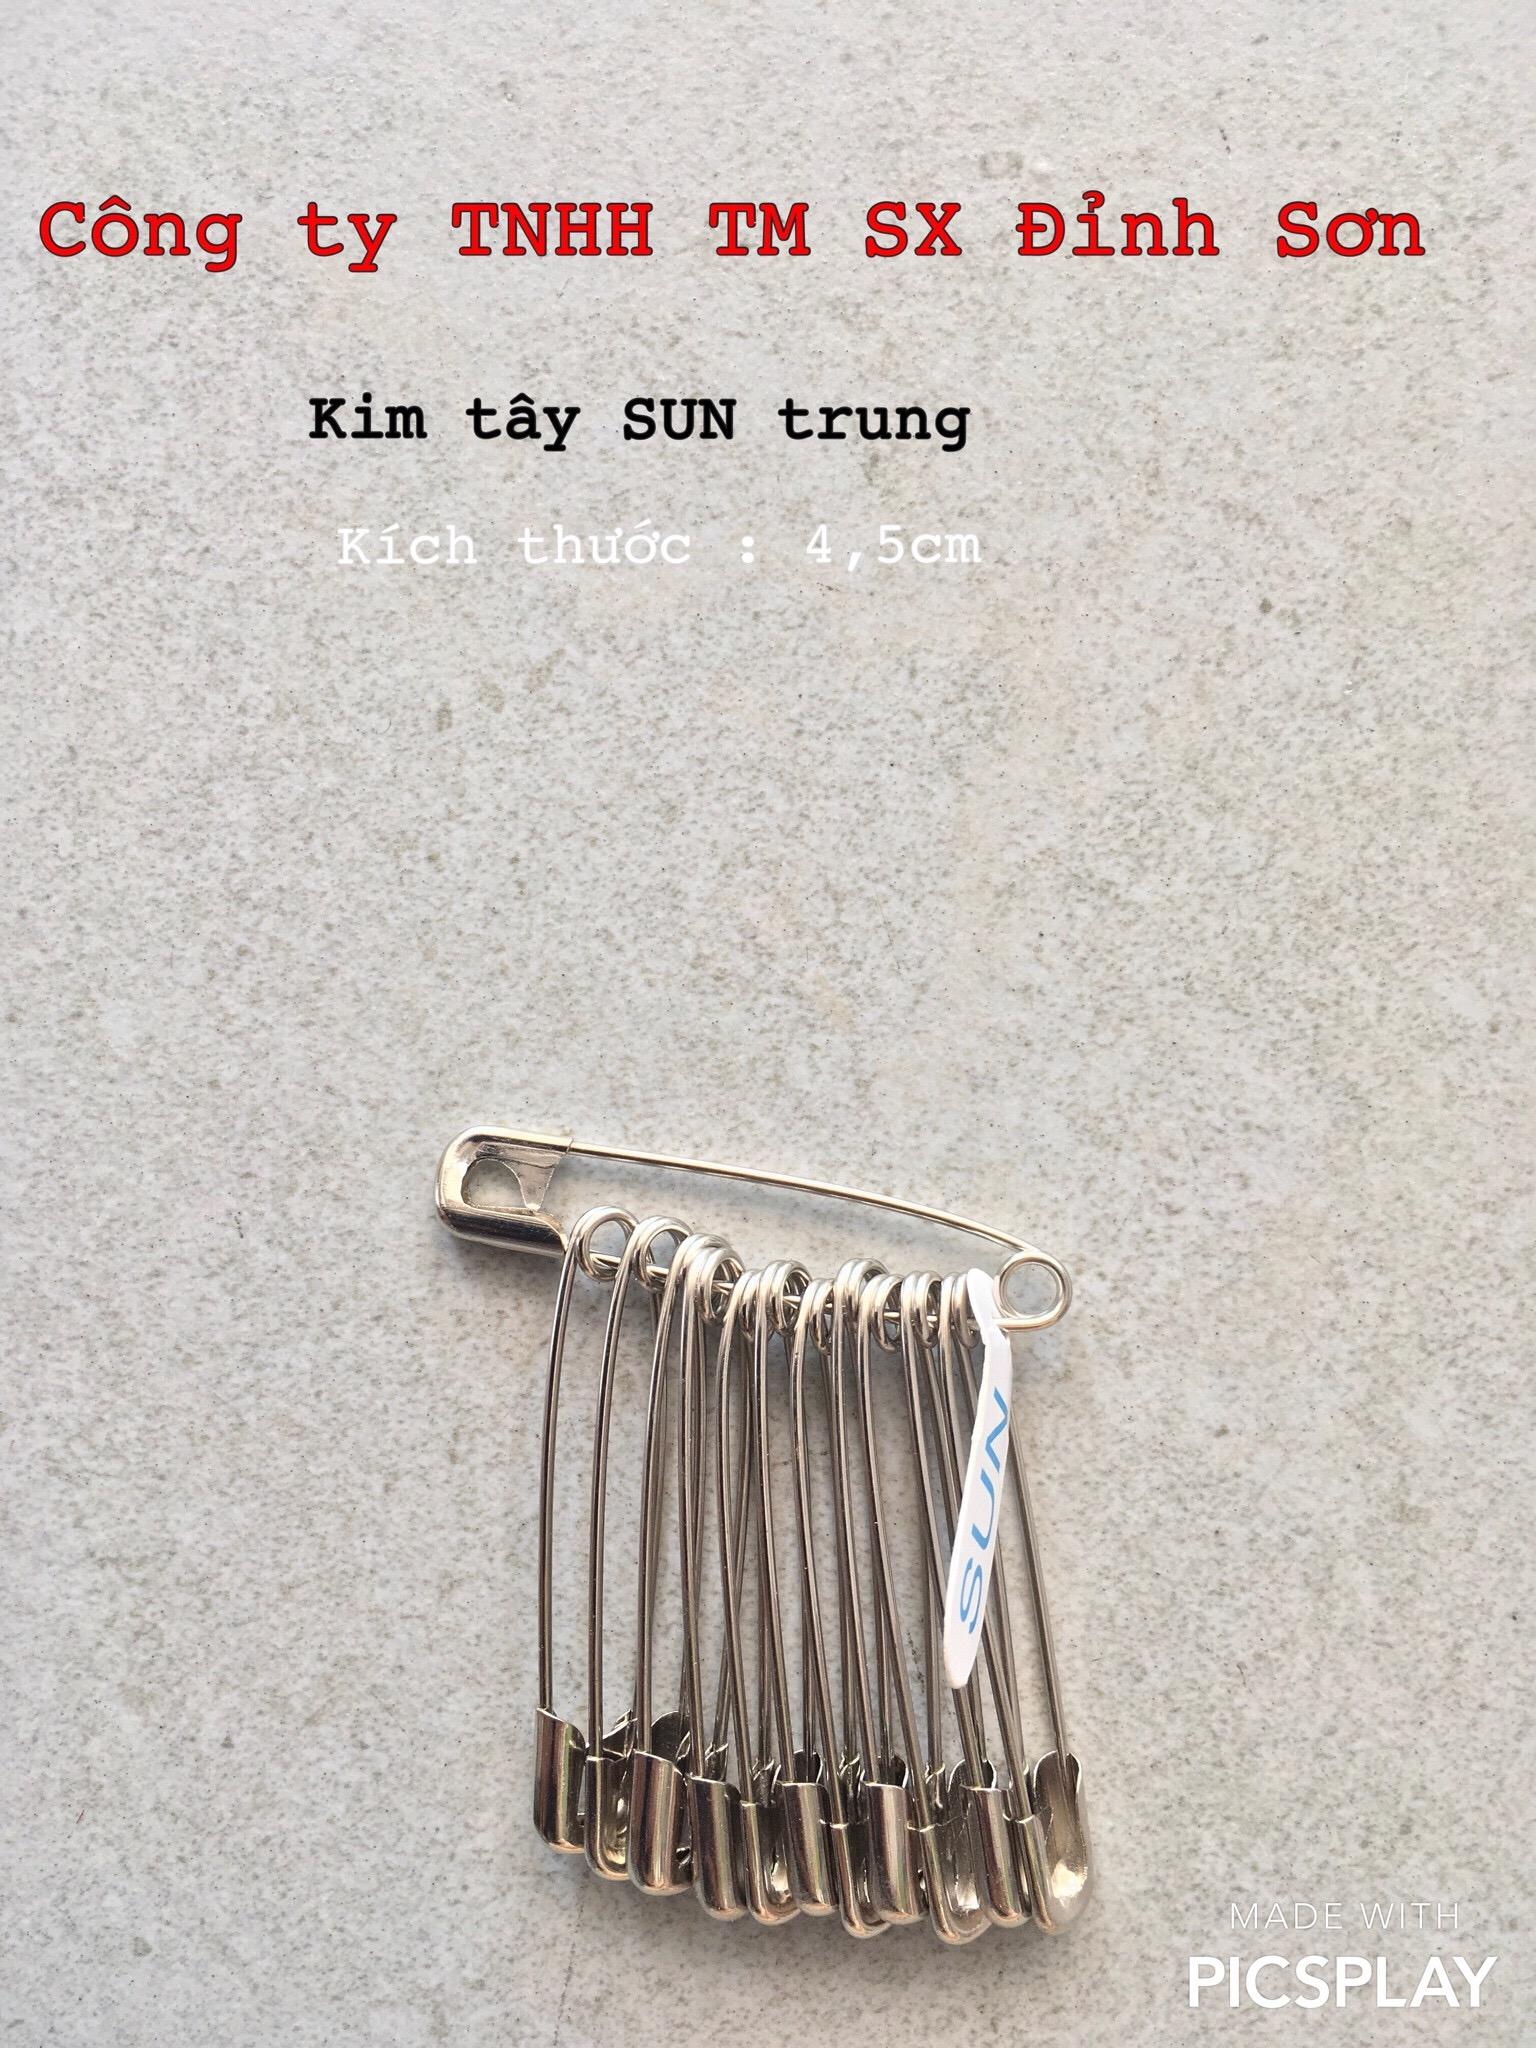 Kim Băng